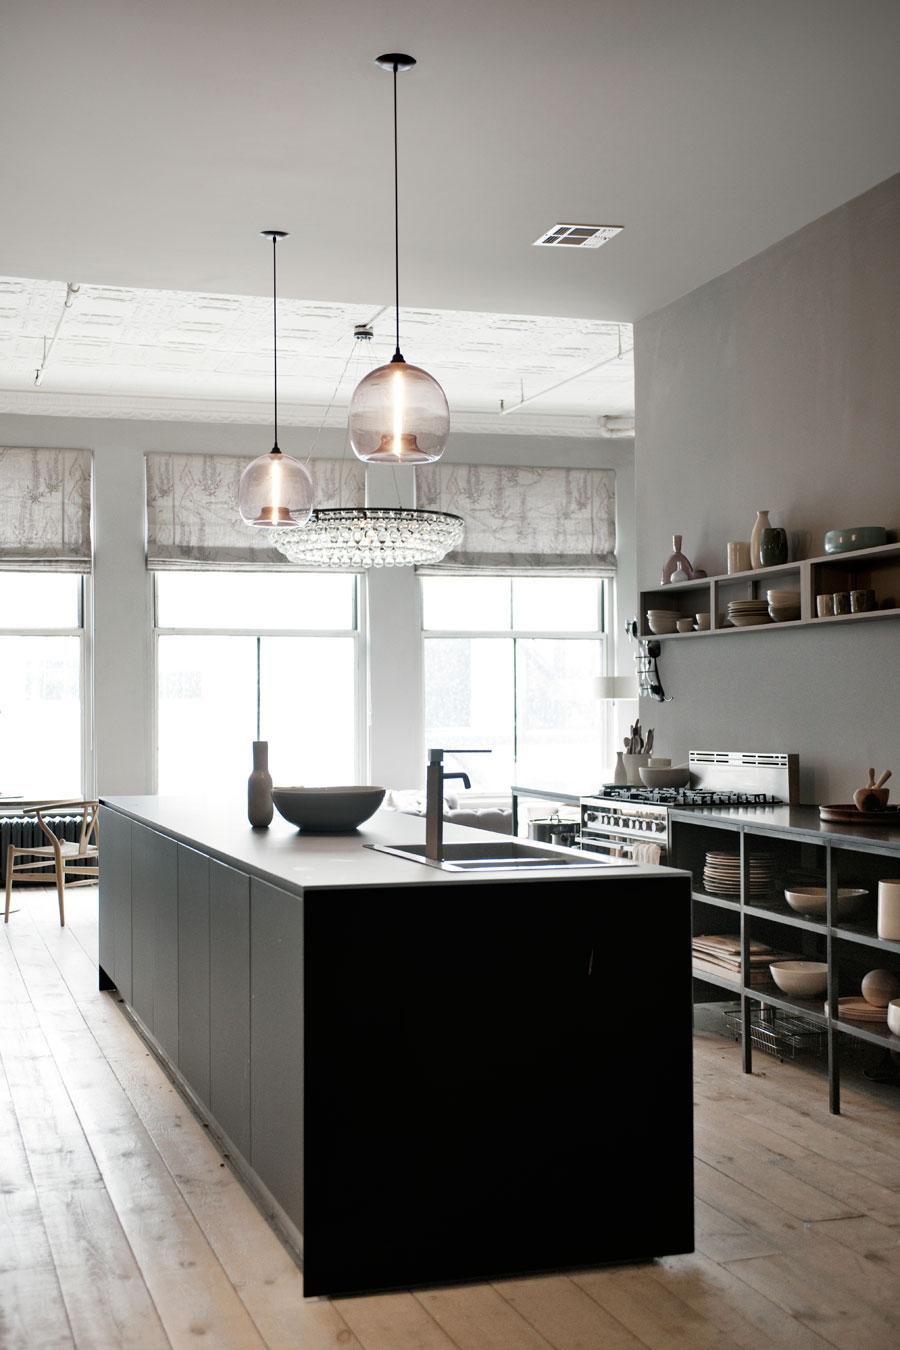 New York - Crosby street apartment - OCHRE